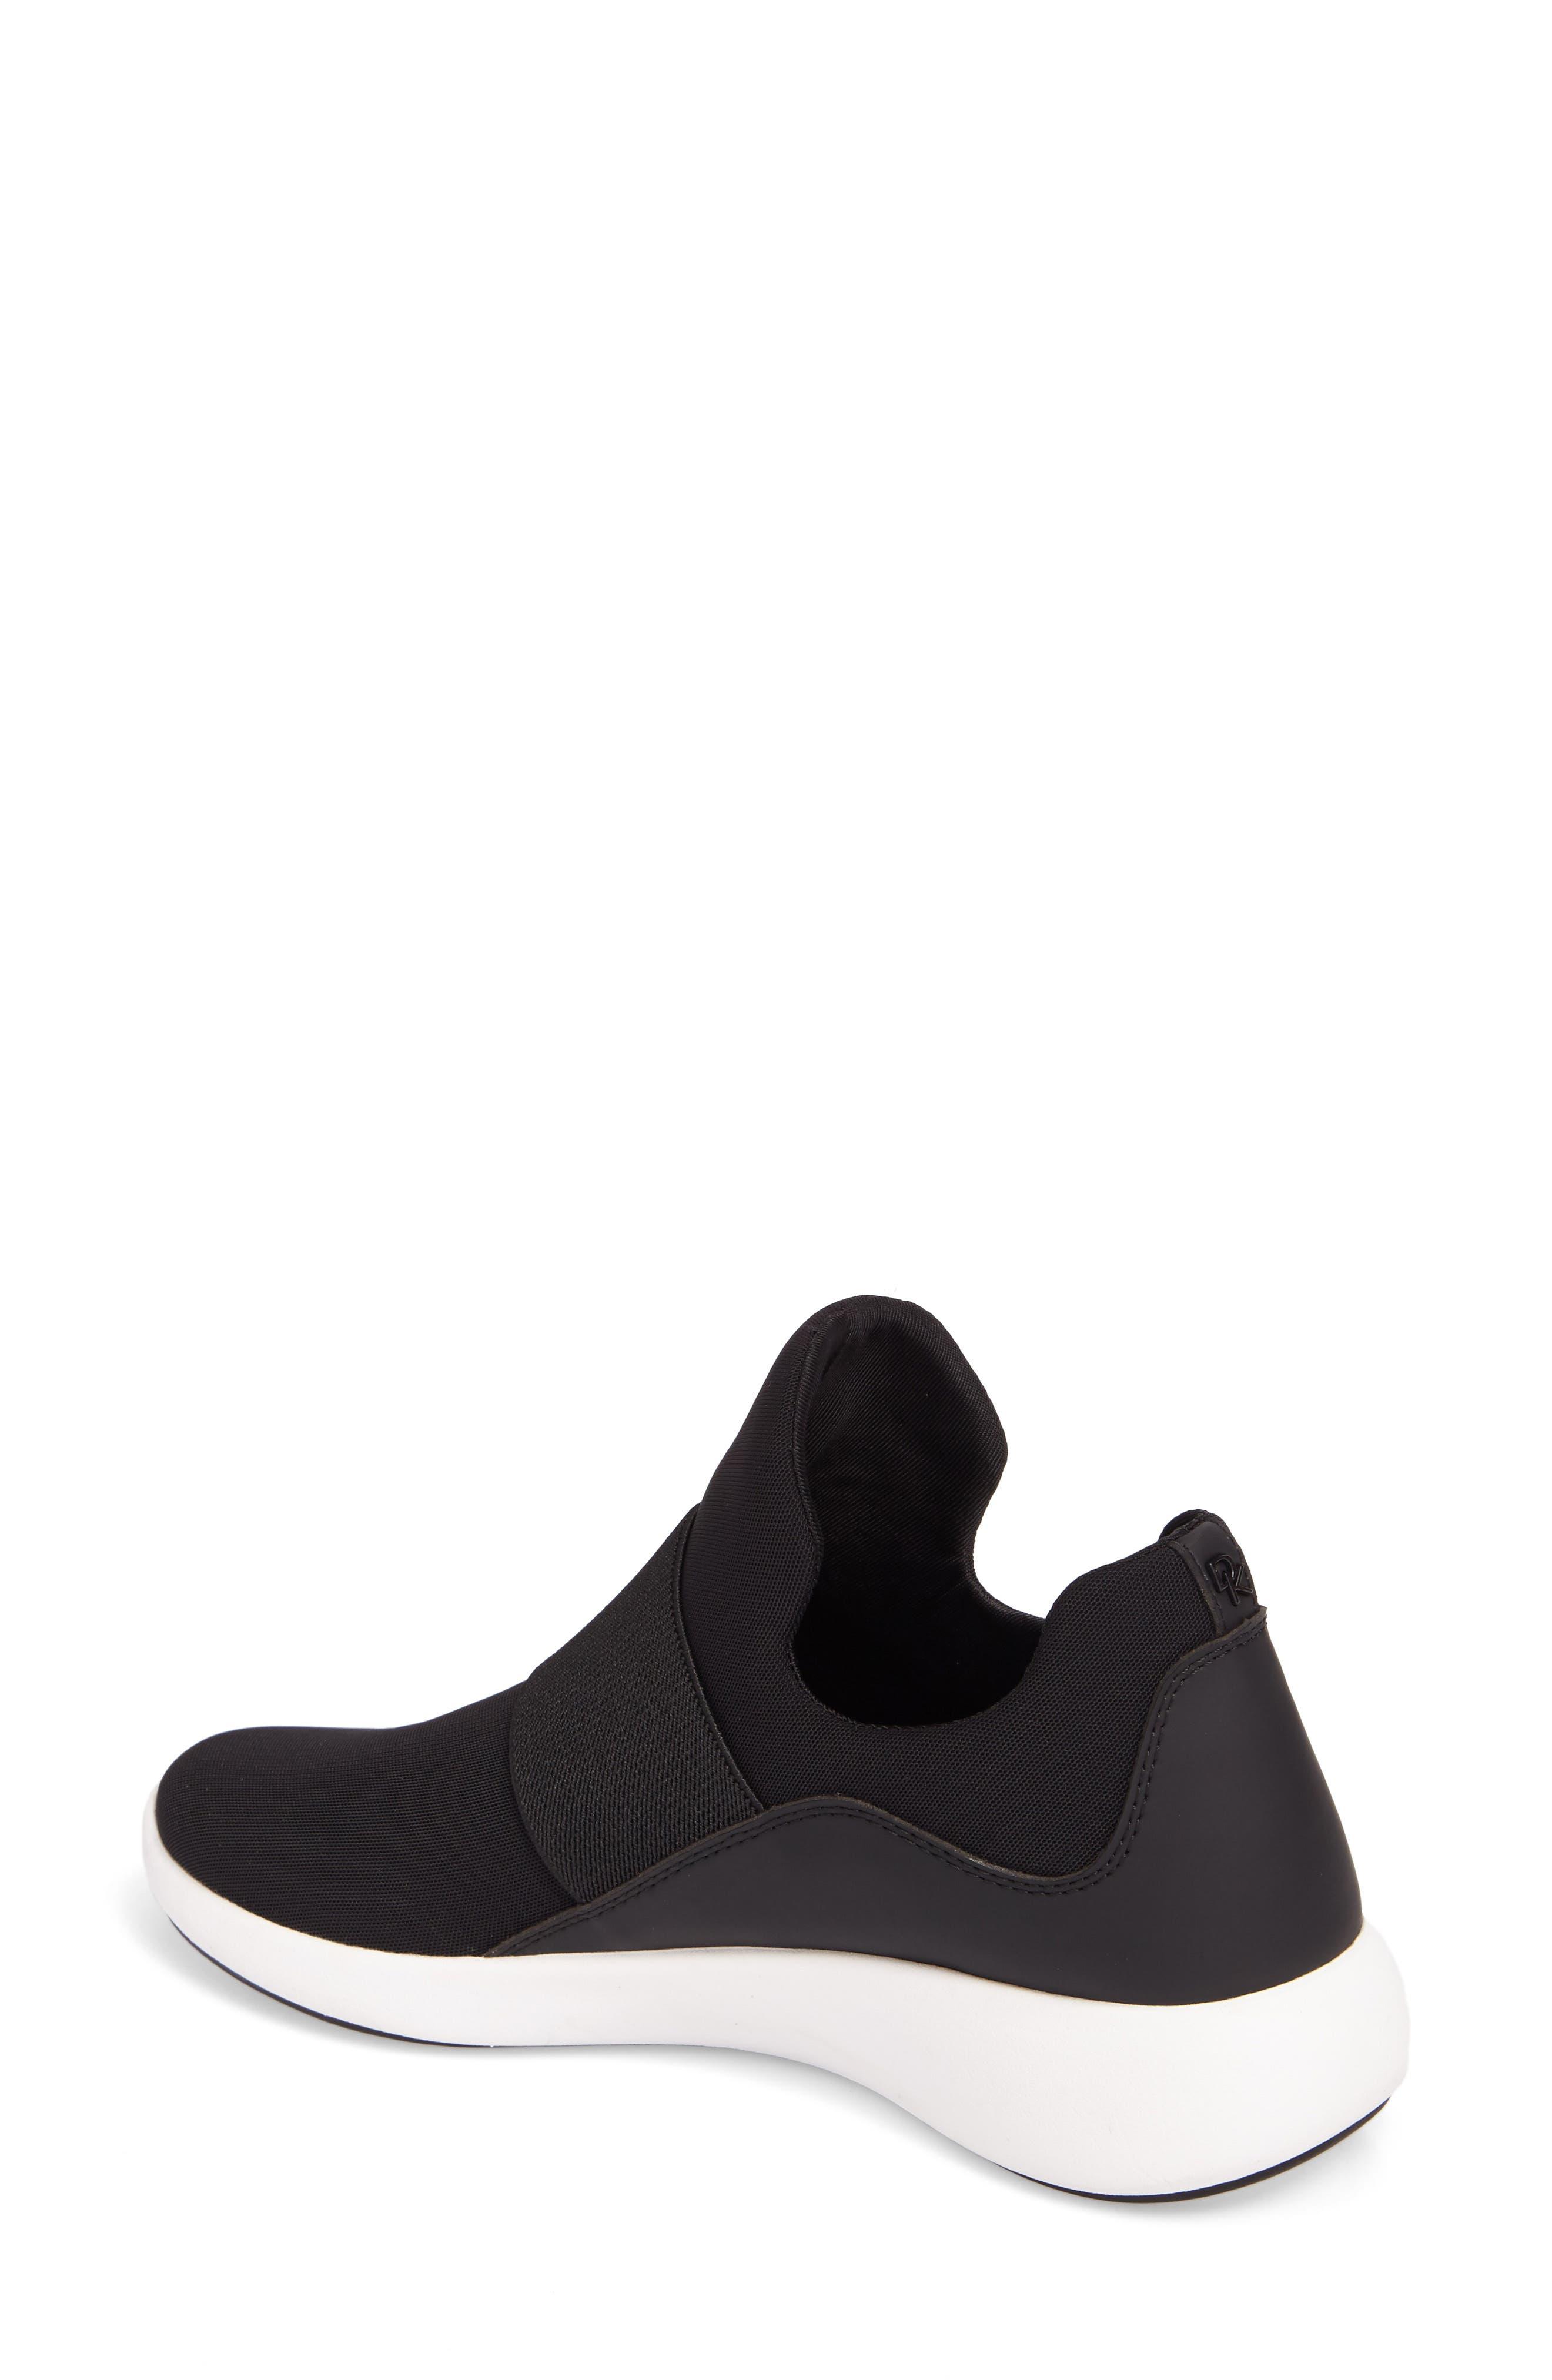 Donna Karan Cory Slip-On Sneaker,                             Alternate thumbnail 2, color,                             001